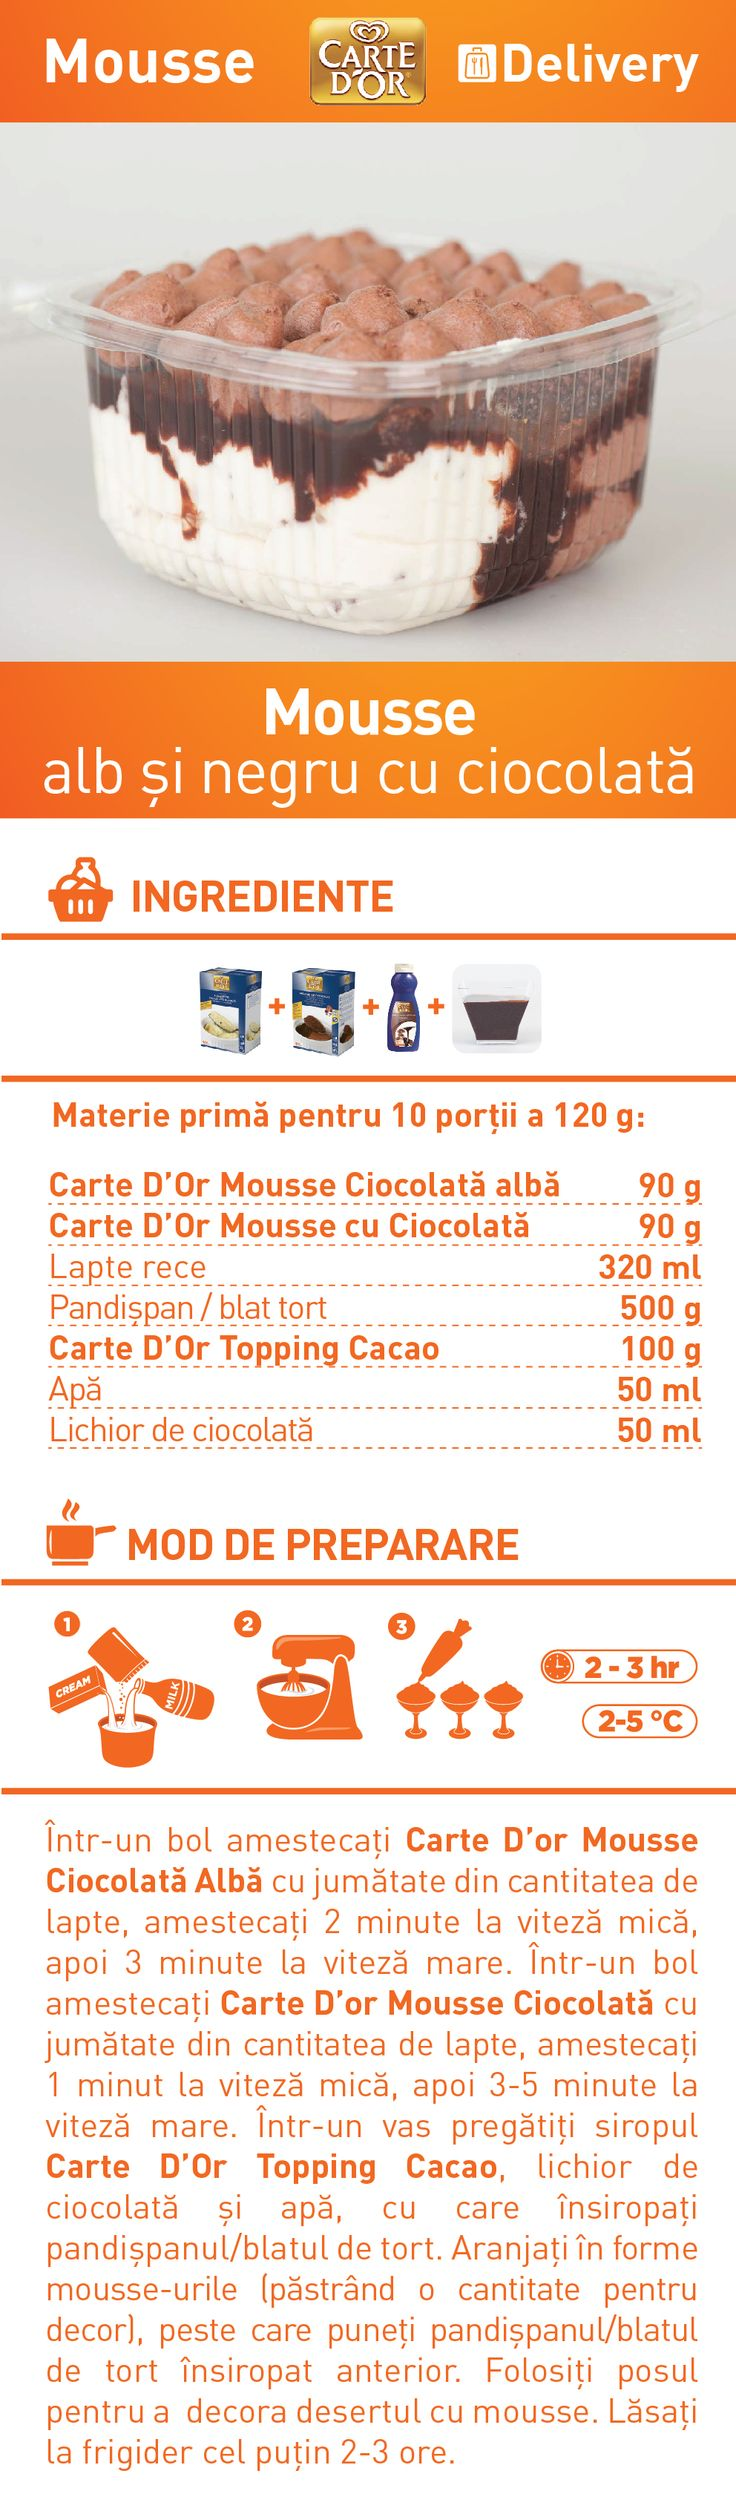 Mousse alb si negru cu ciocolata - RETETA